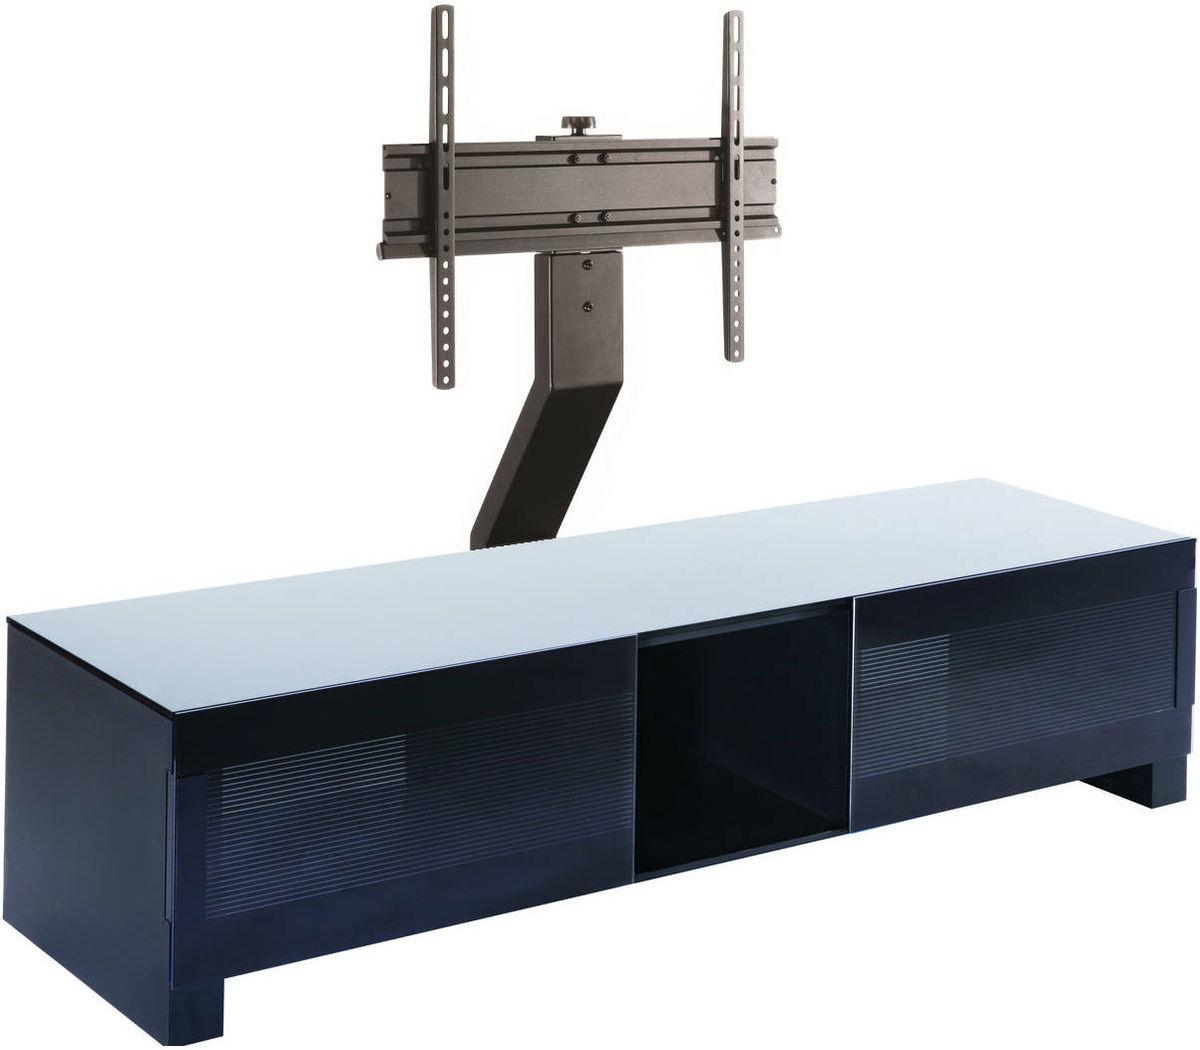 erard bilt 1400 colonne meubles avec support son vid. Black Bedroom Furniture Sets. Home Design Ideas